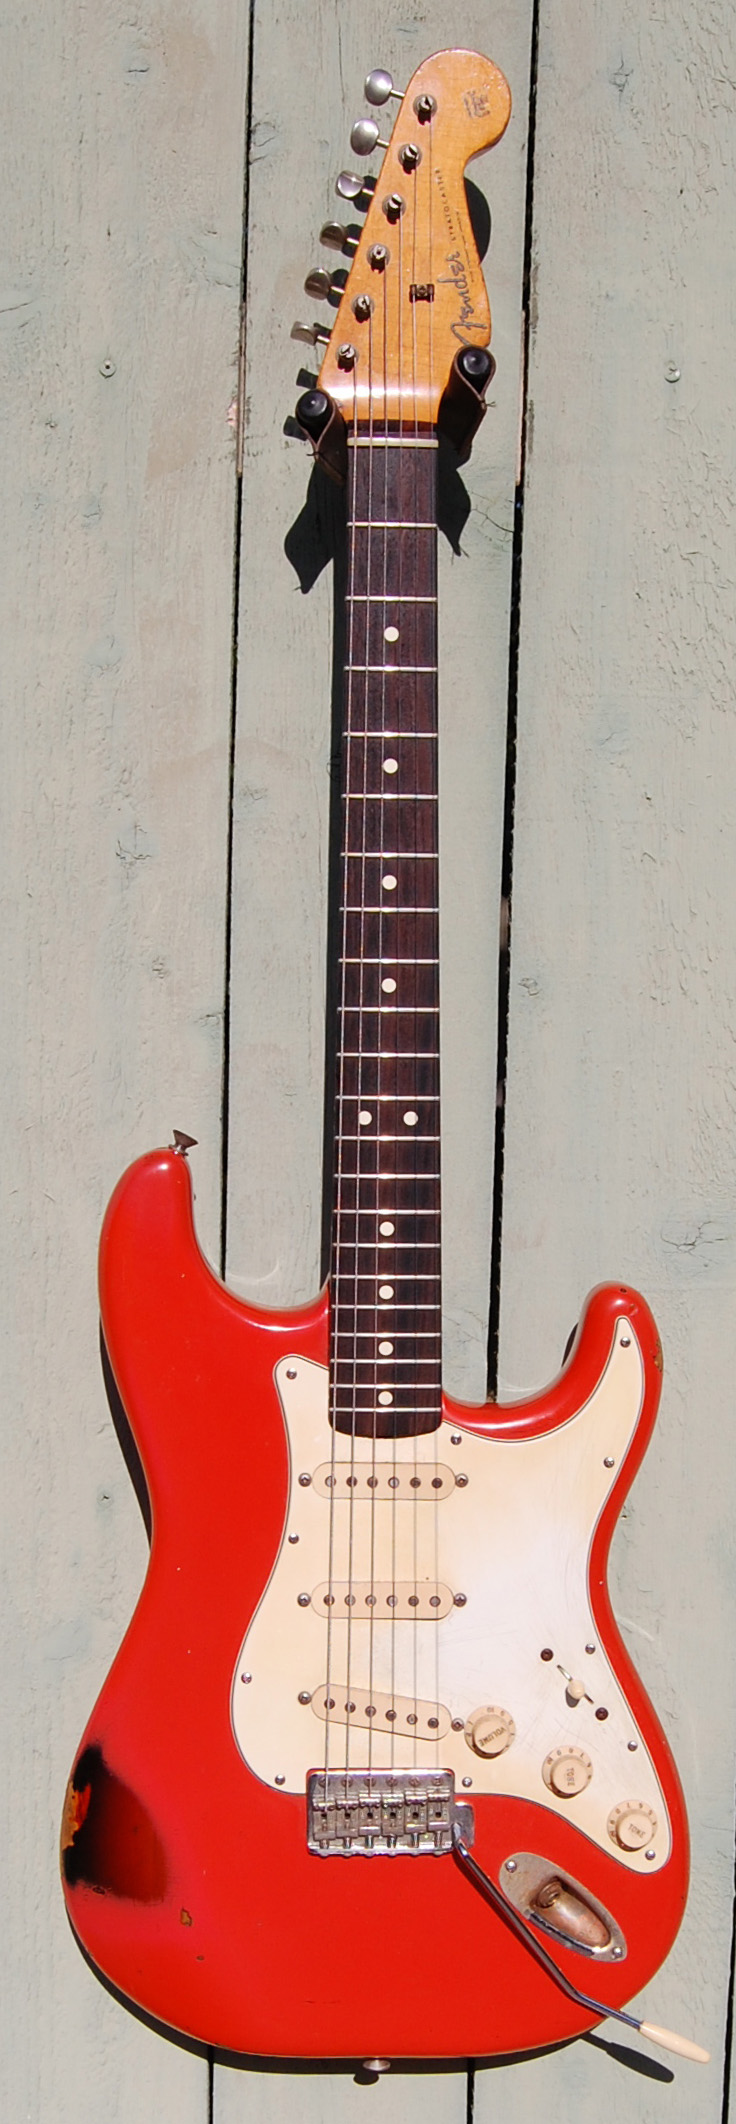 1983 aVRI '62 strtocaster